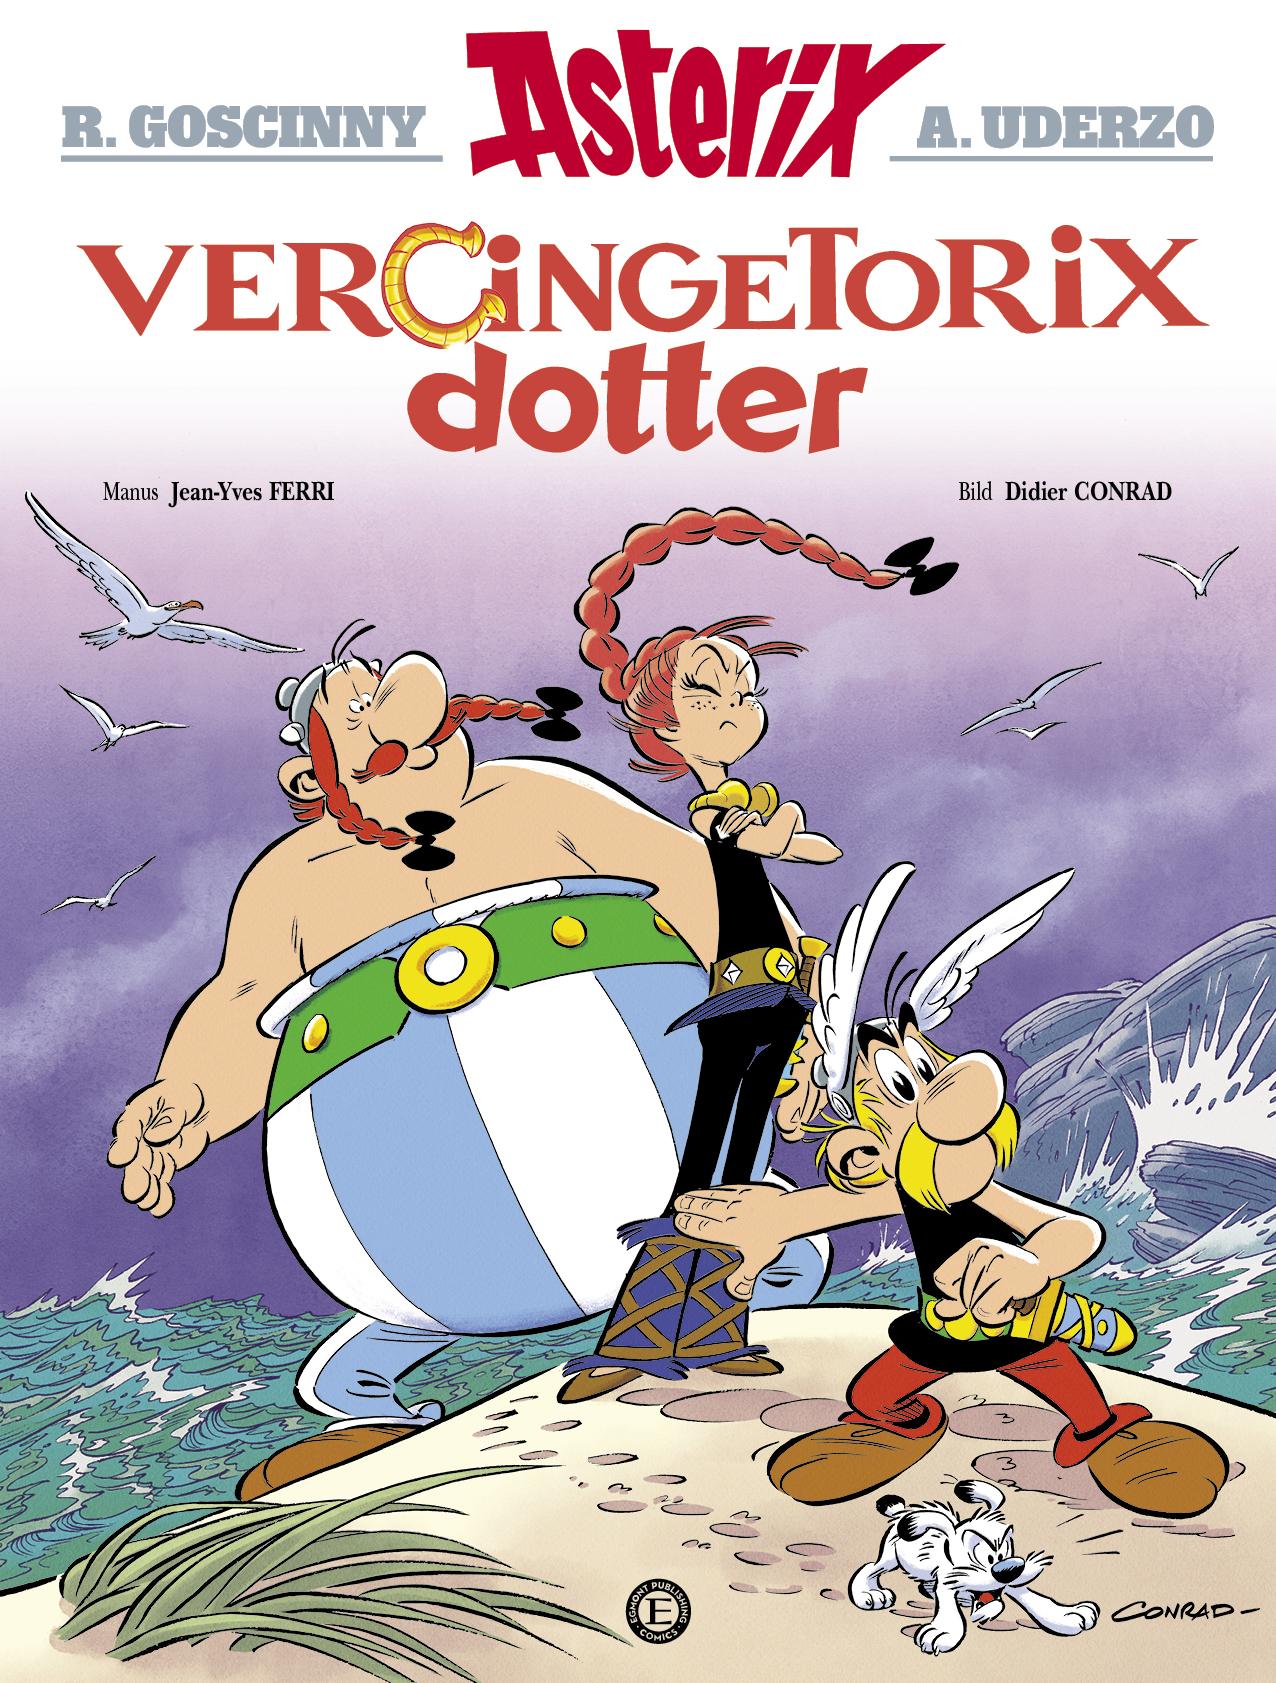 Asterix 38: Vercingetorix dotter